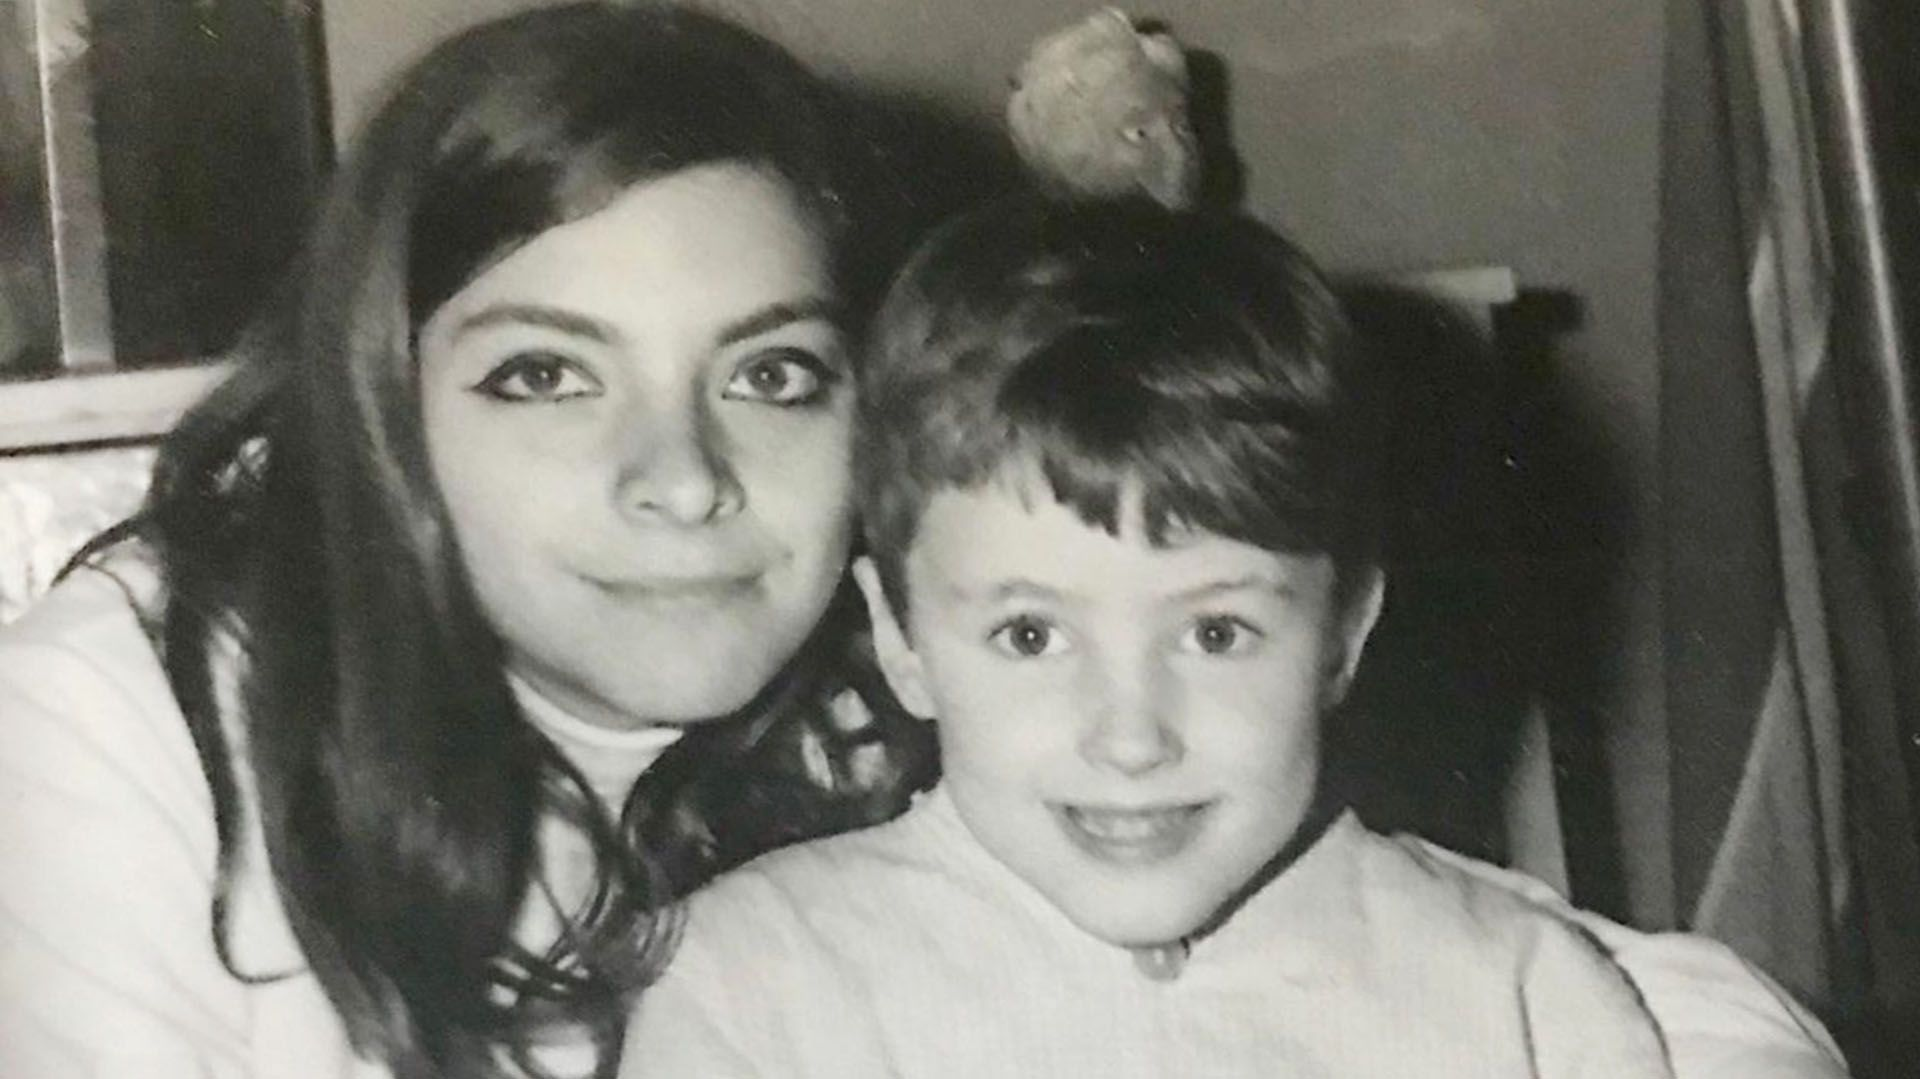 Hugo Capparelli durante su infancia